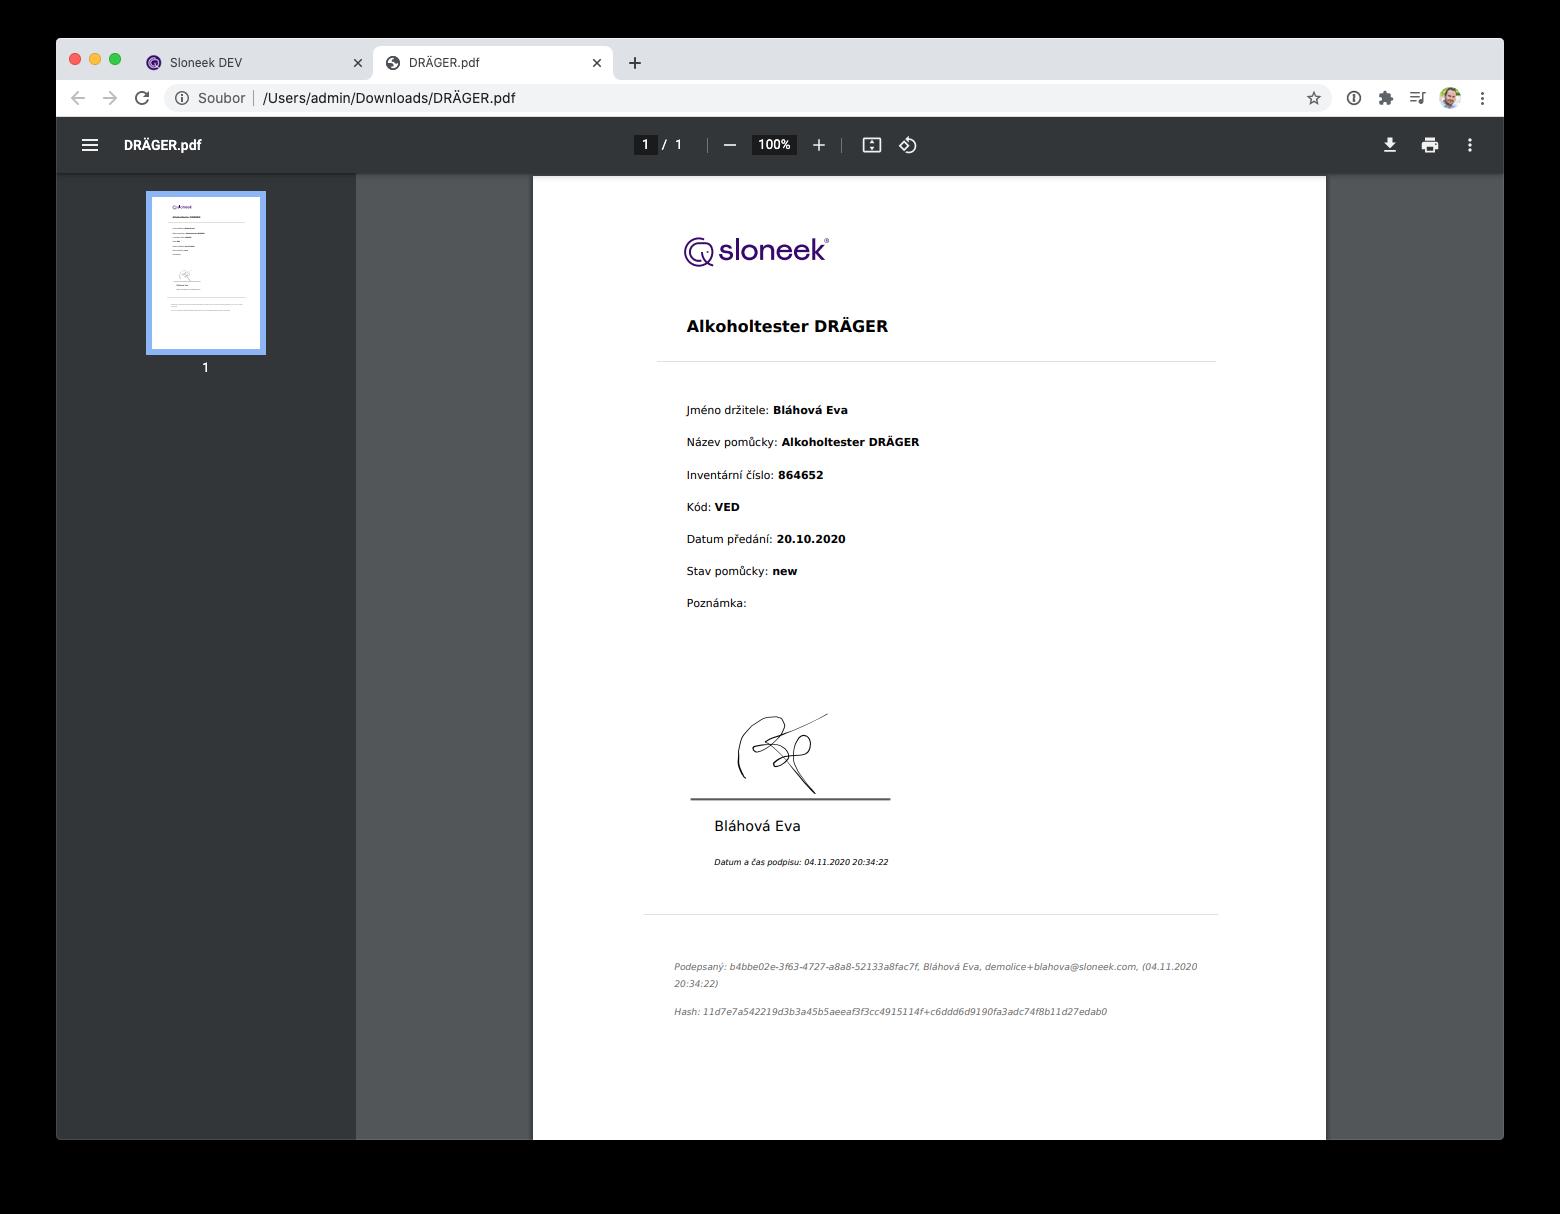 Podepsaný protokol